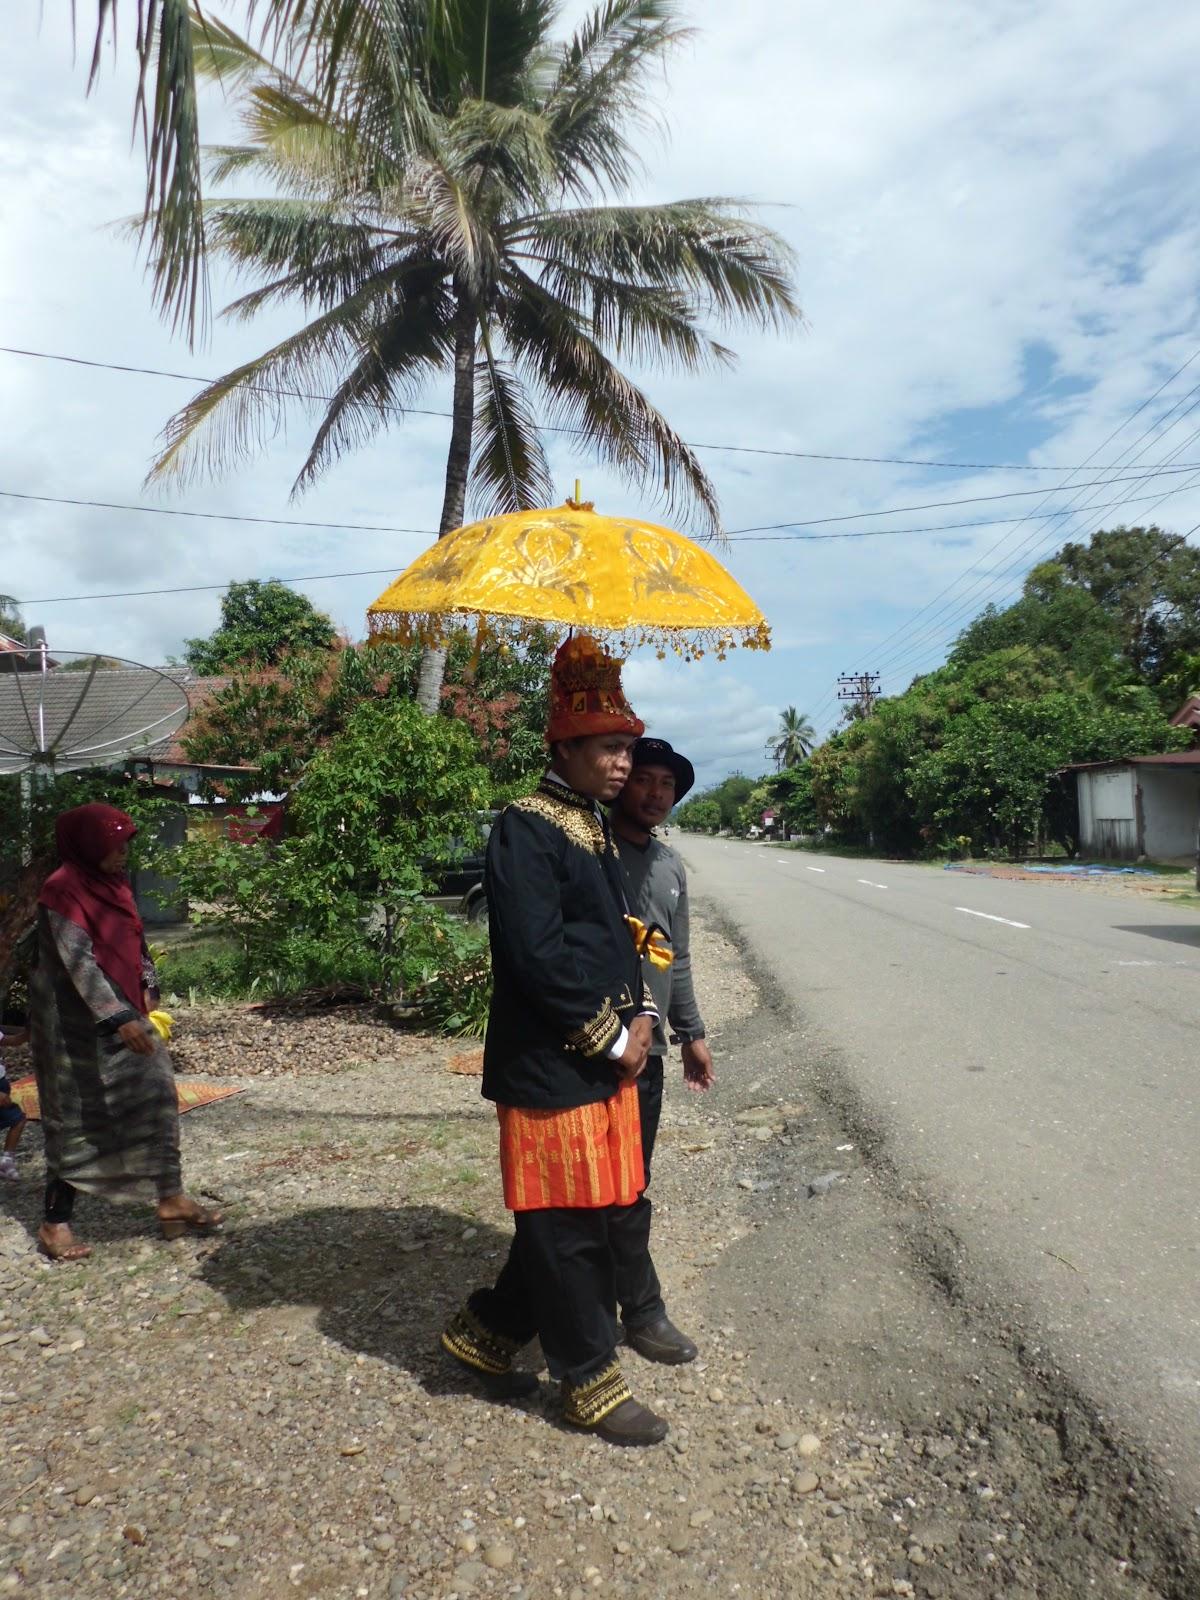 Adat Dan Prosesi Pernikahan Di Aceh Selatan Fardelyn Hacky